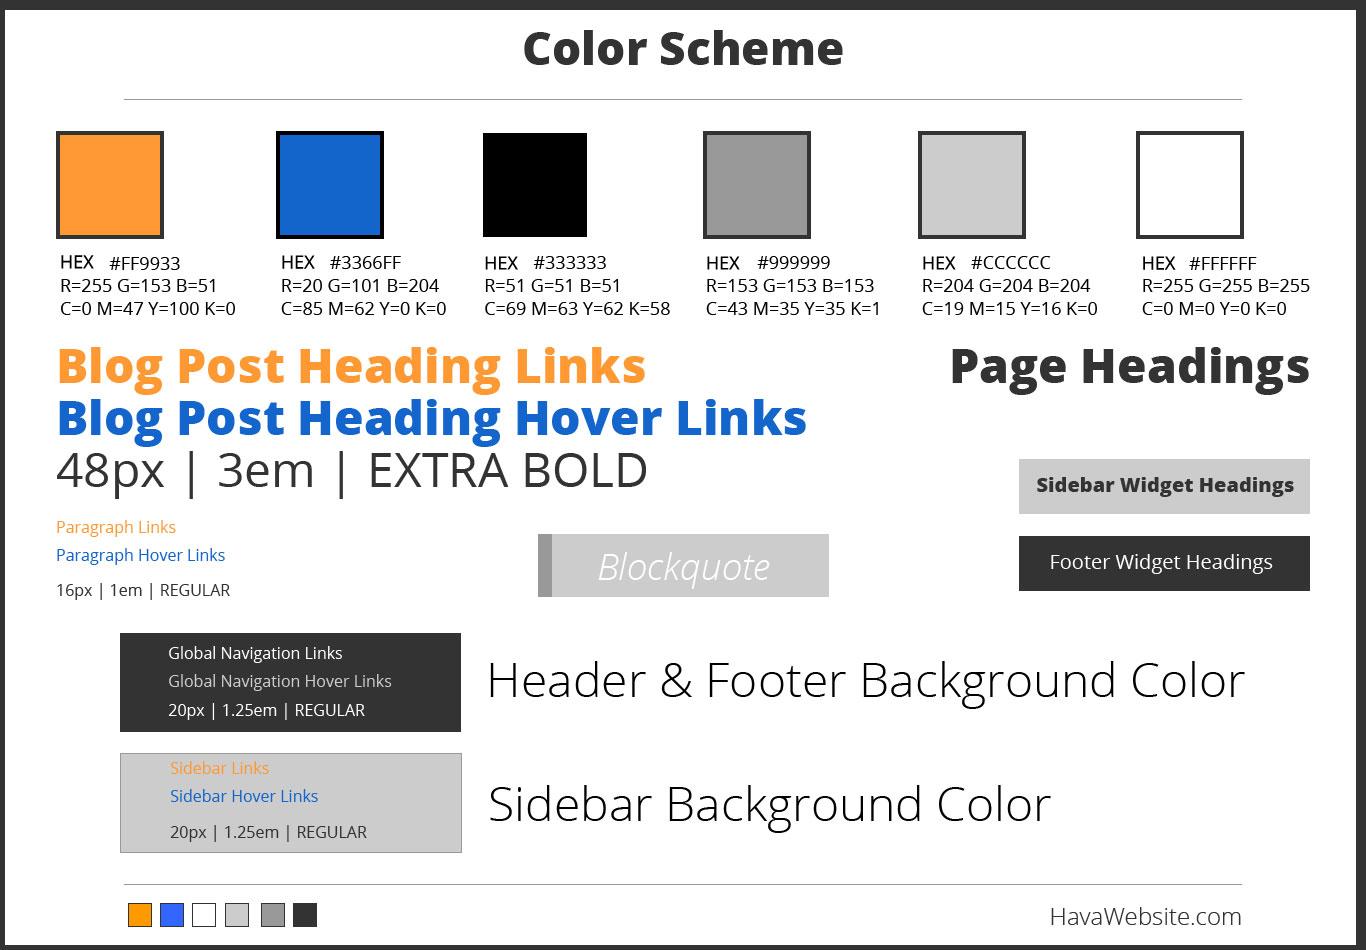 Website Design Services HavaWebsite